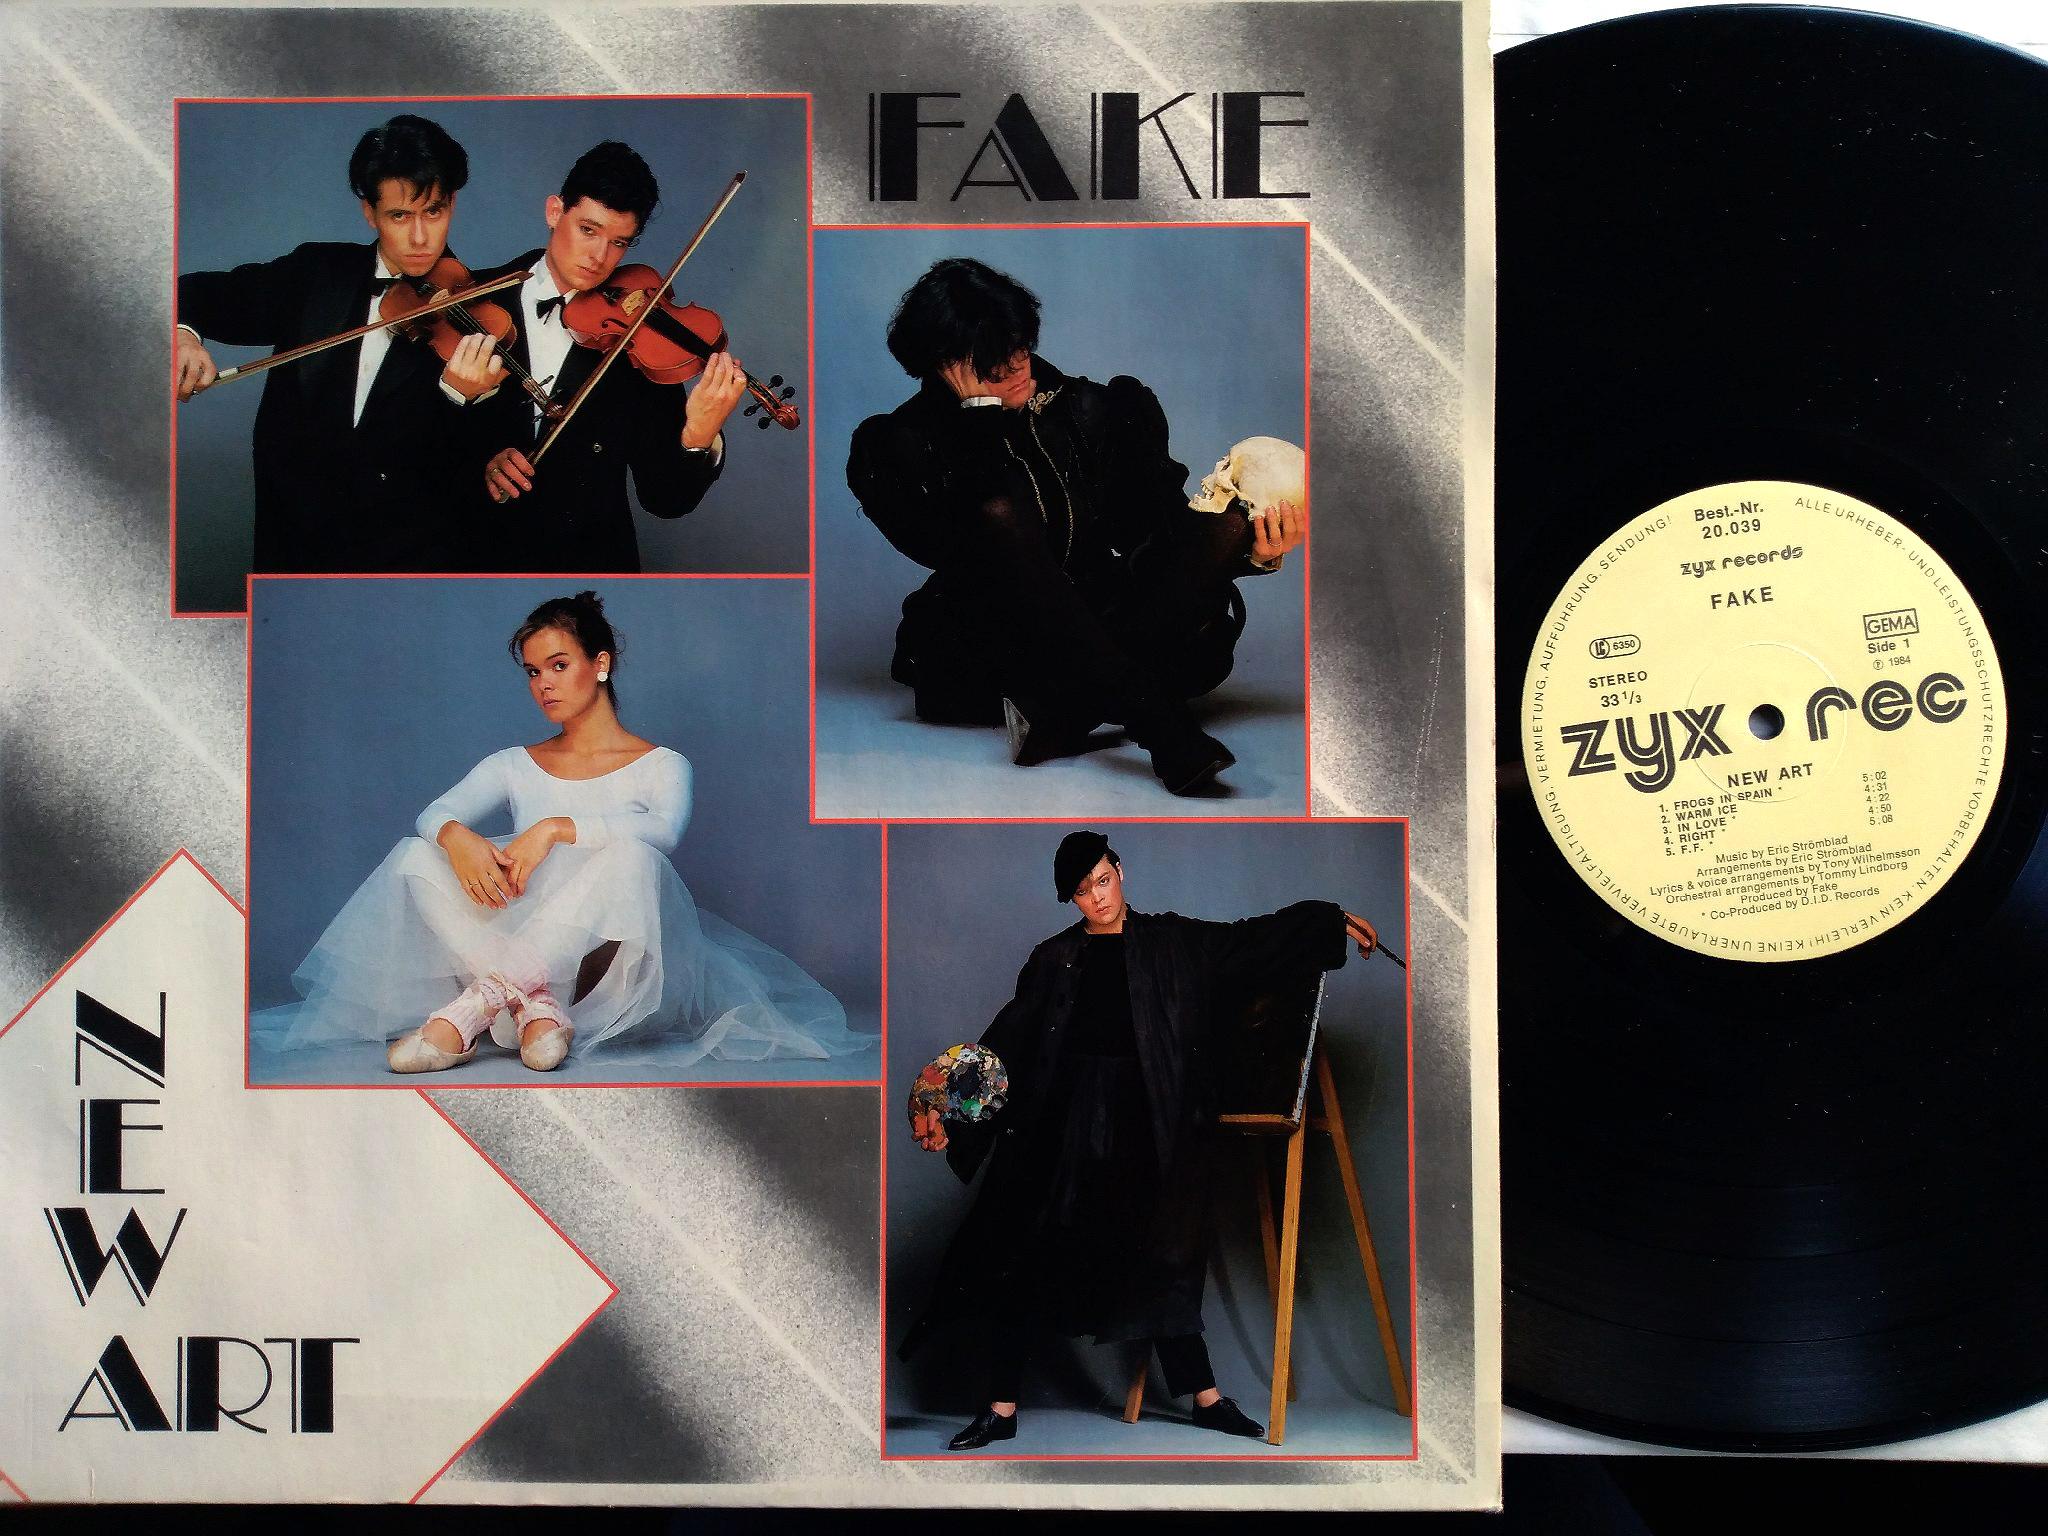 Fake - New Art LP